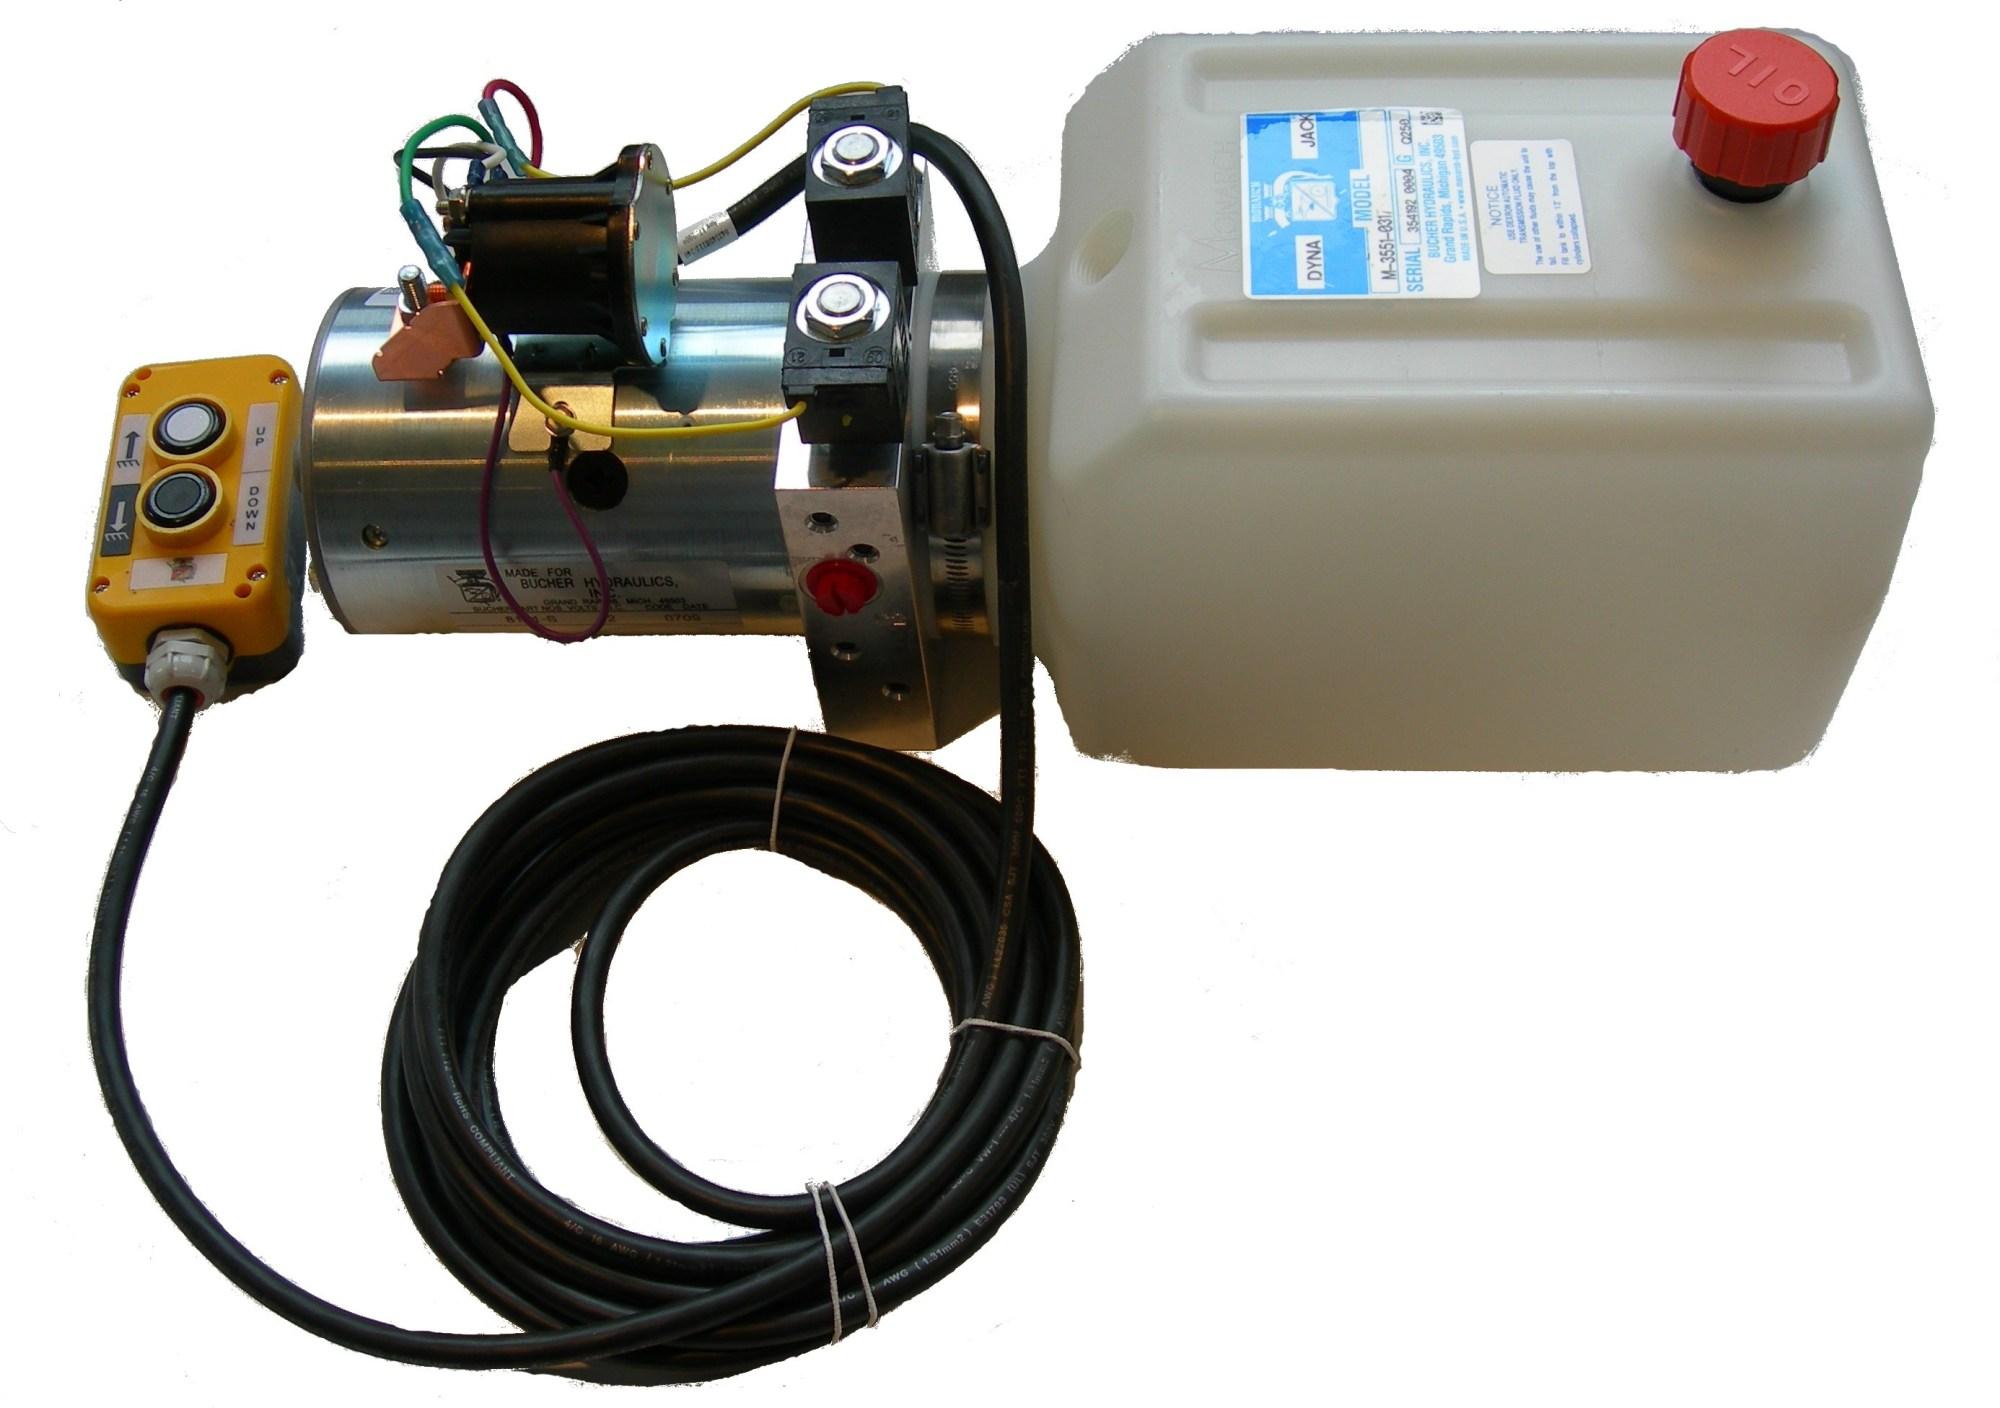 hight resolution of monarch 12 volt dc power unit